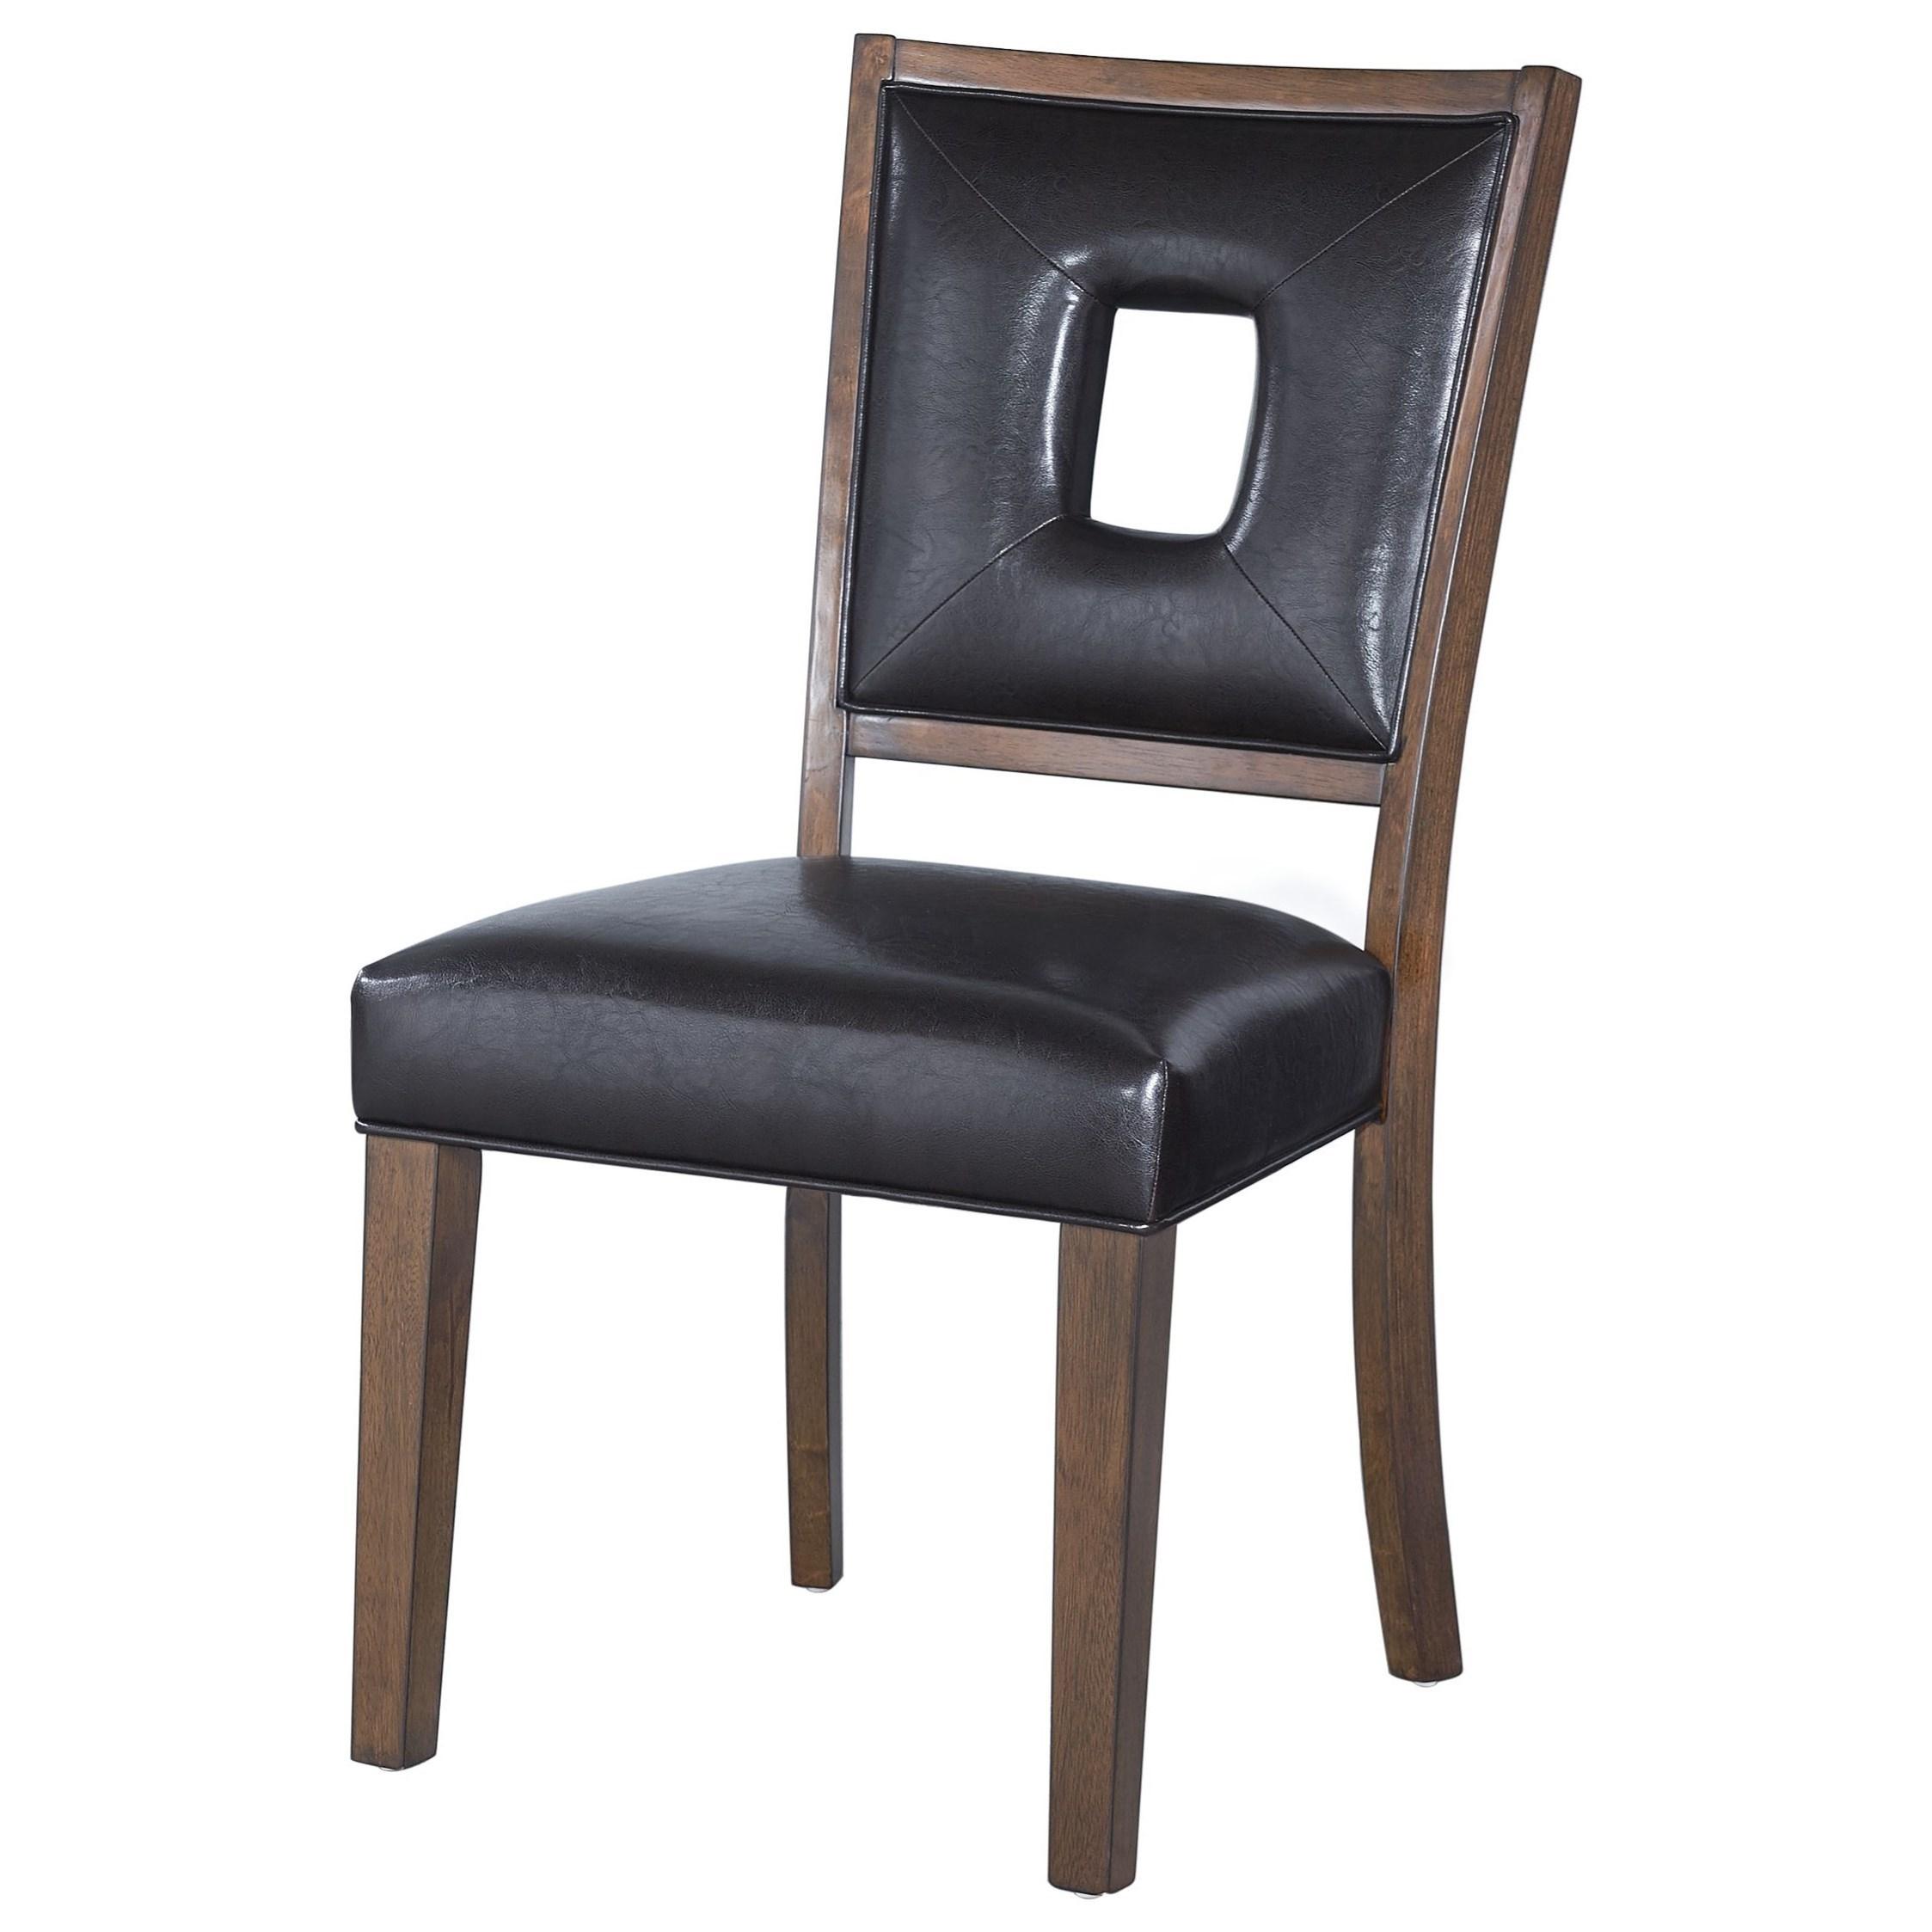 Swell Toulon Side Chair Short Links Chair Design For Home Short Linksinfo